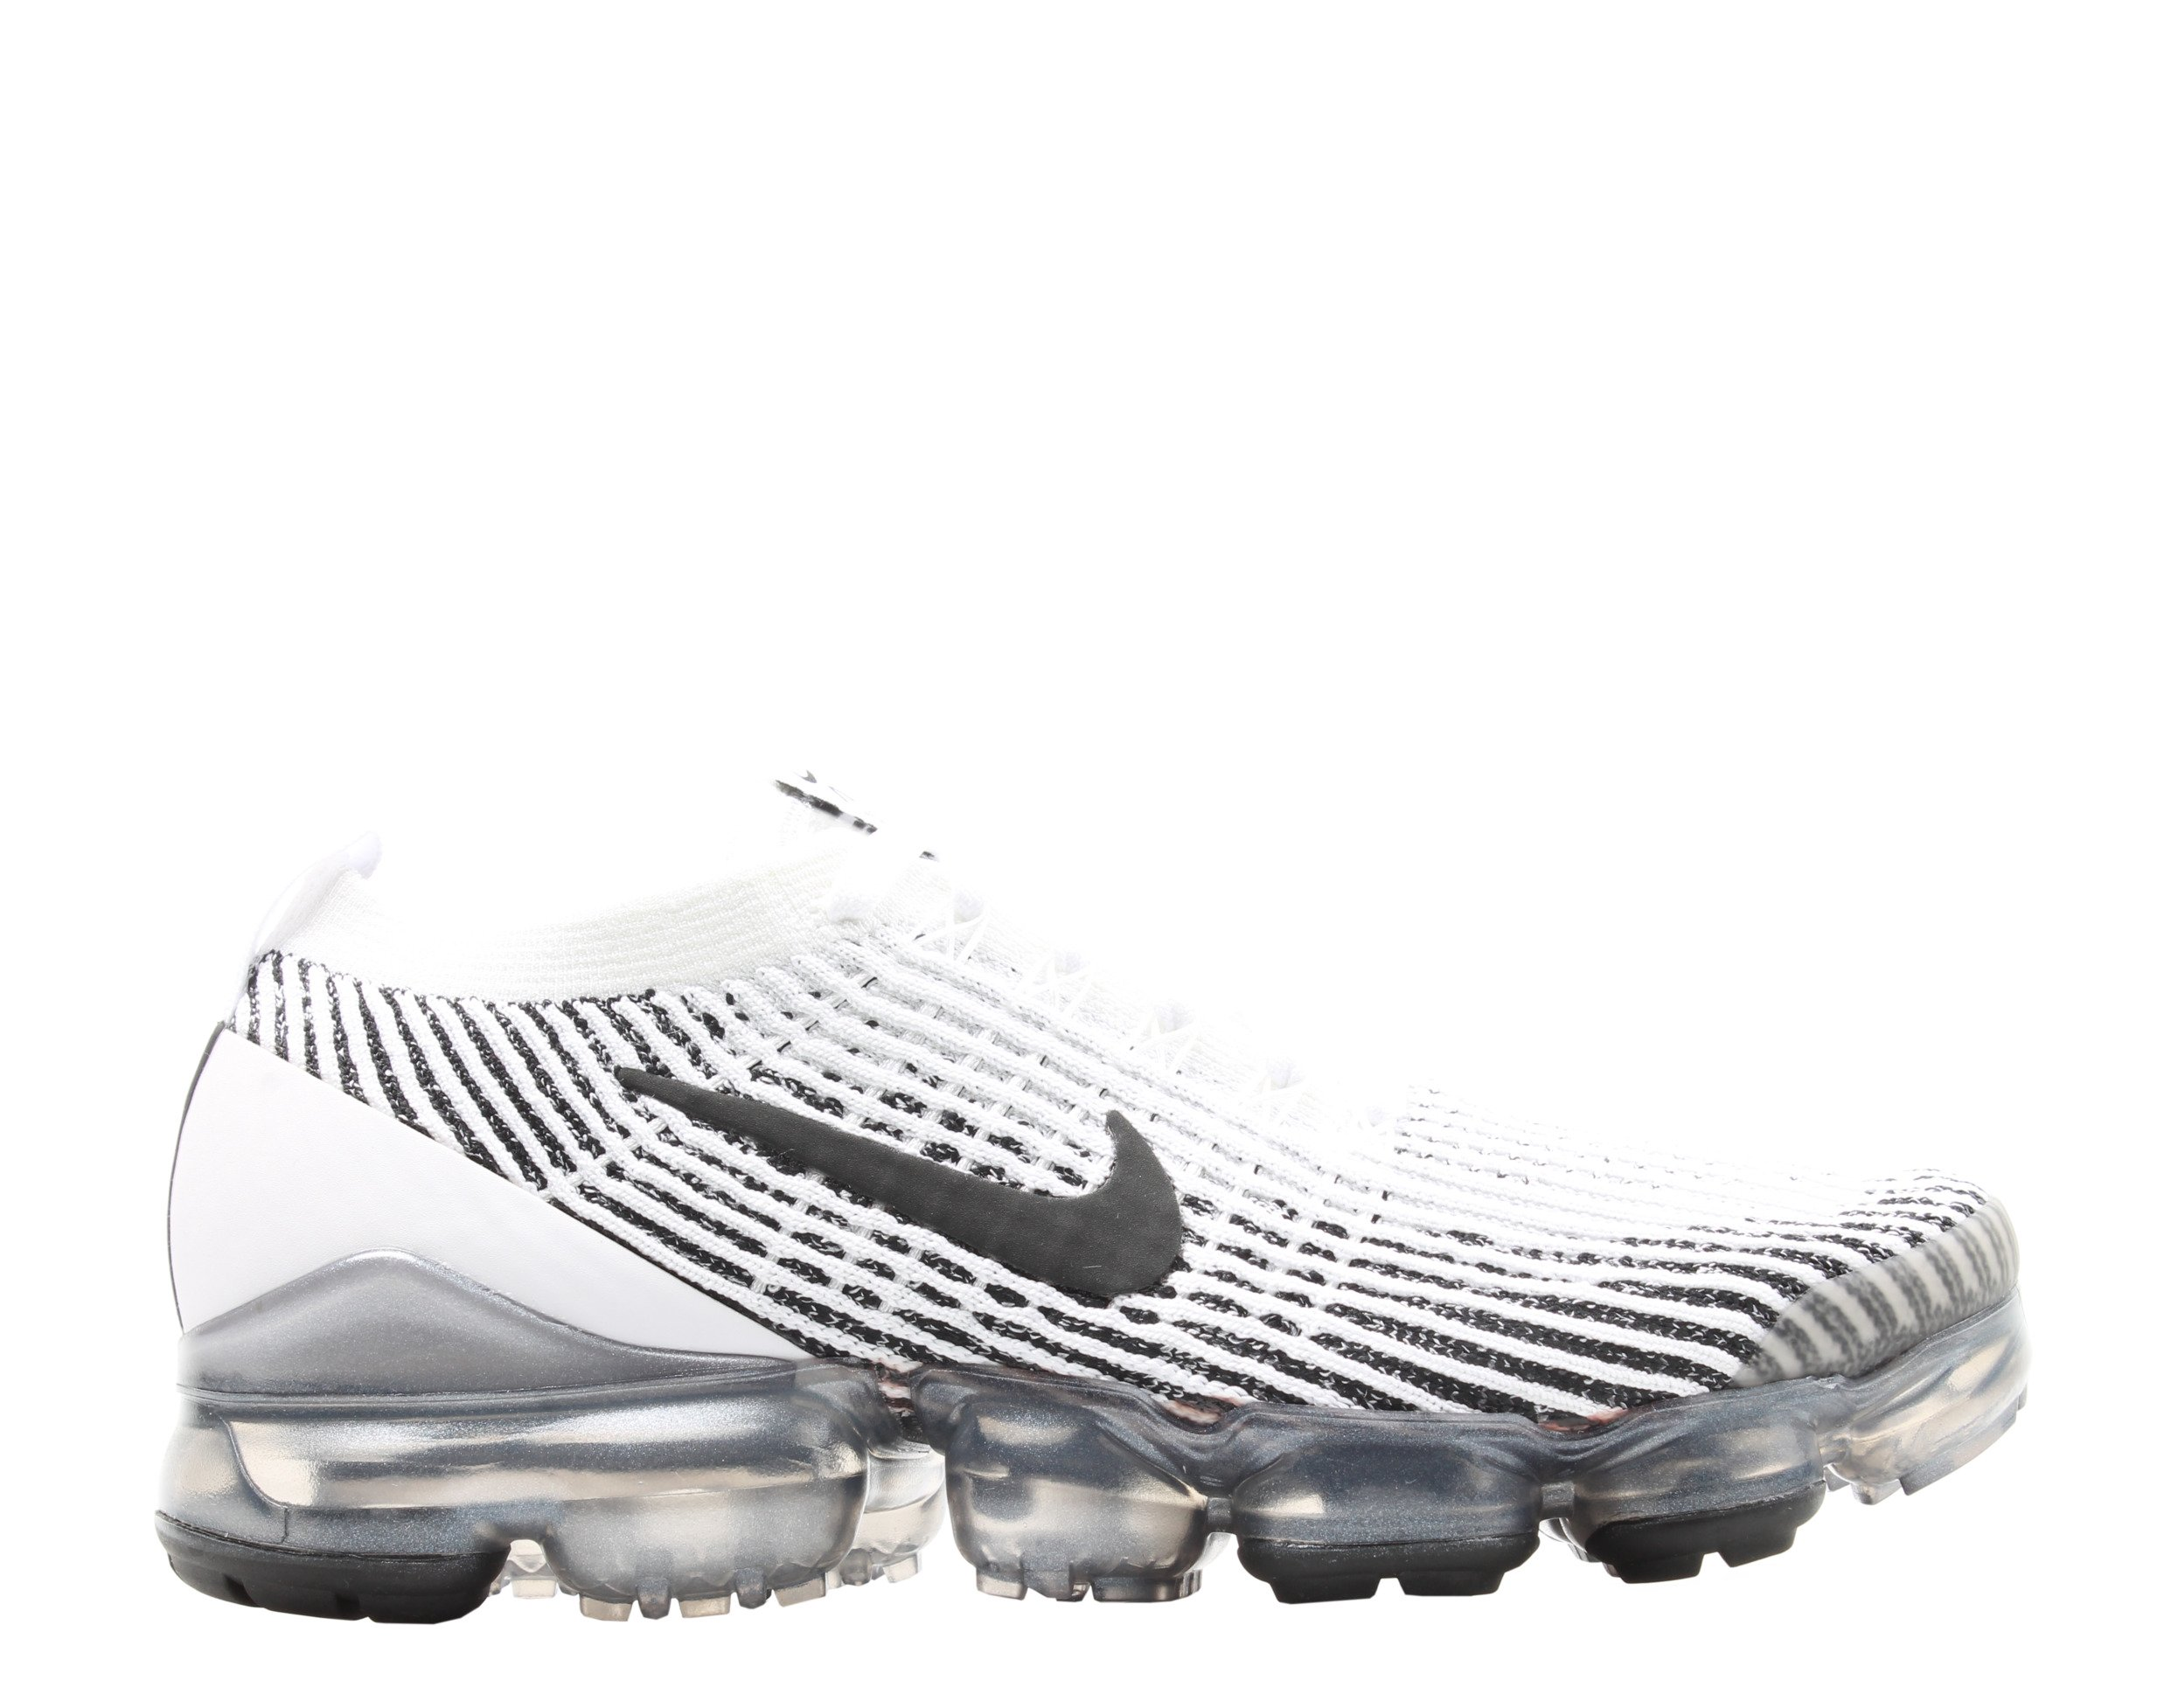 Nike Nike Air VaporMax Flyknit 3 Zebra WhiteBlack Men's